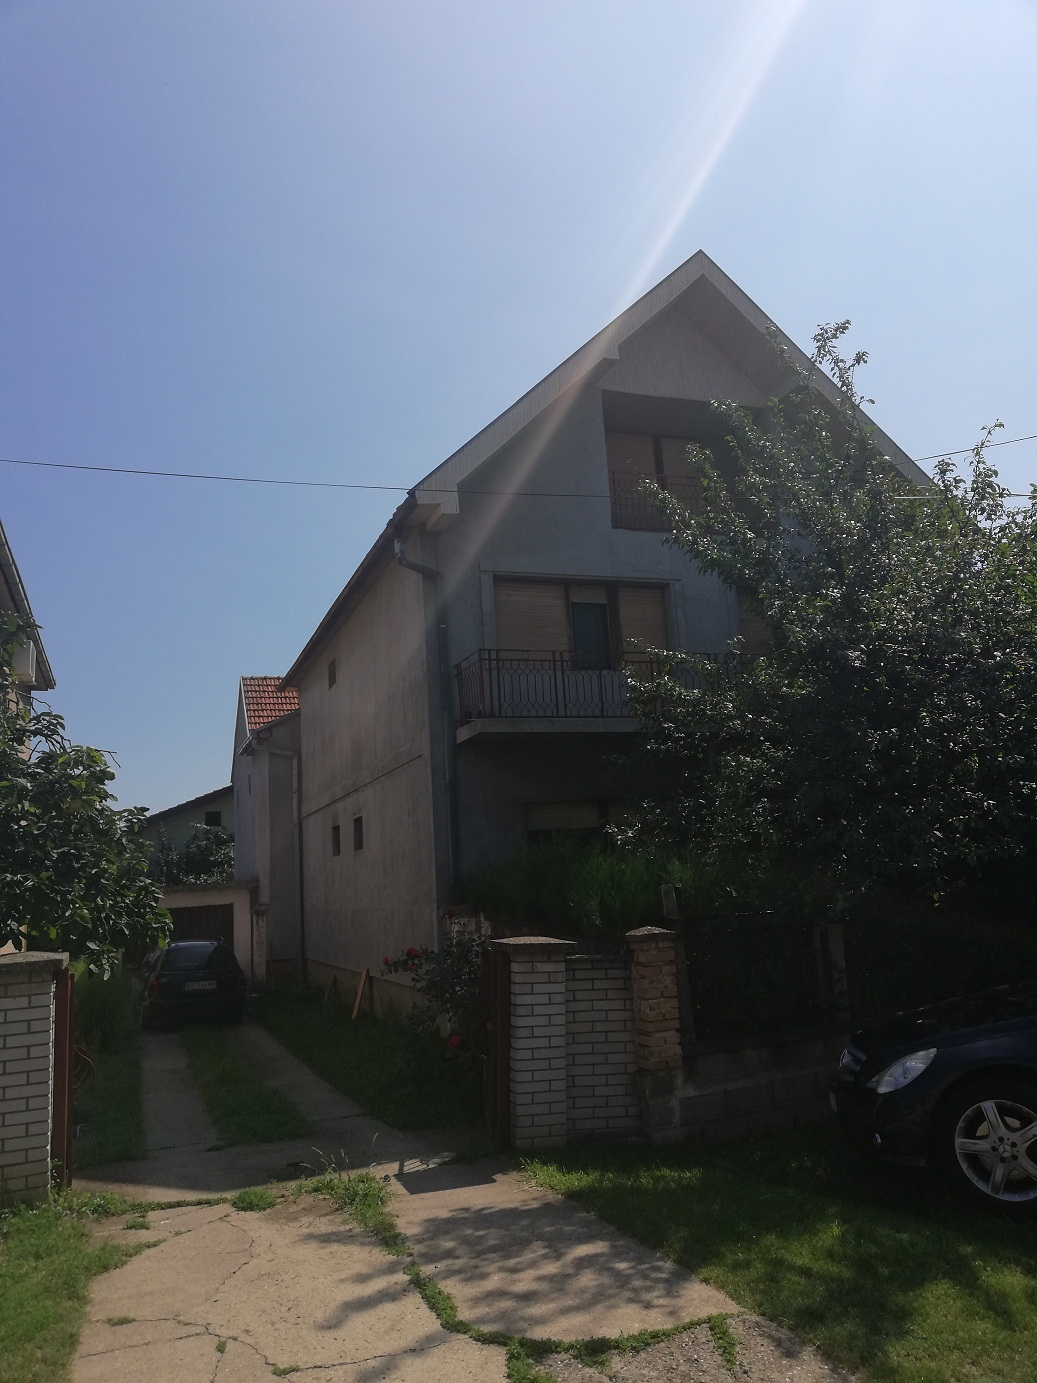 Spratna kuća sa tri stana na placu 14 x 25 m